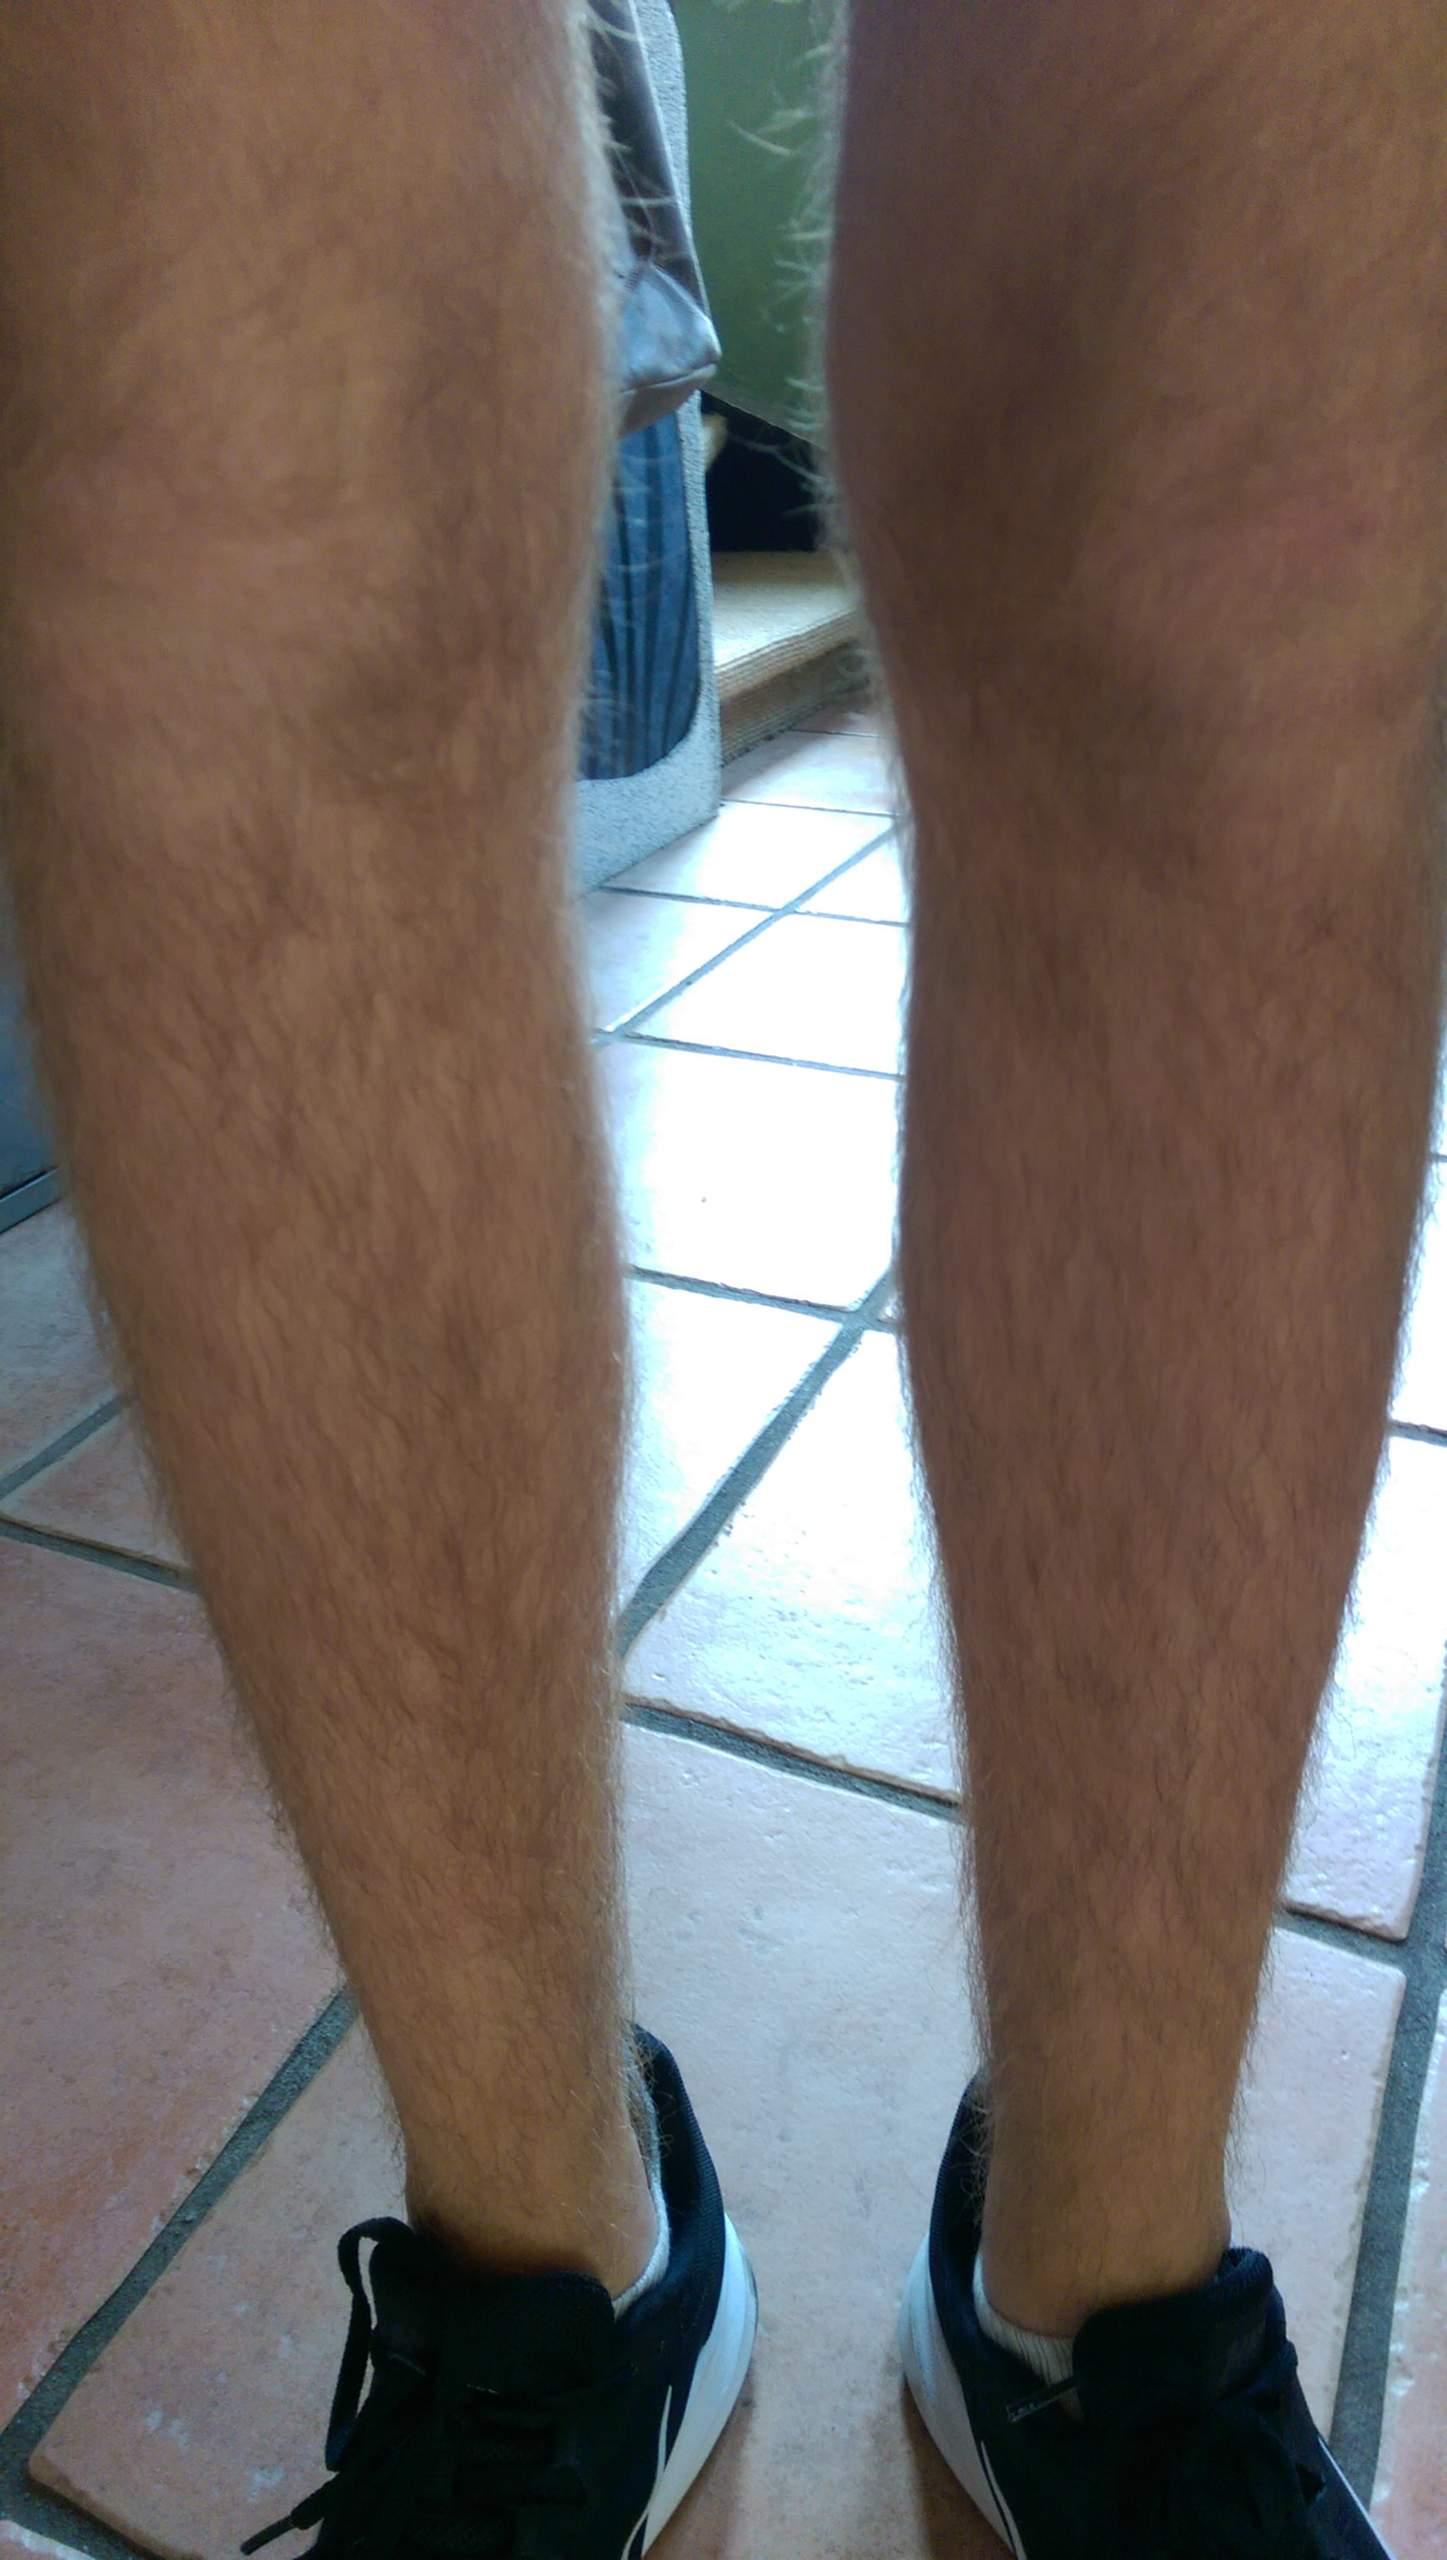 Kürzen männer beinhaare Haarentfernung bei